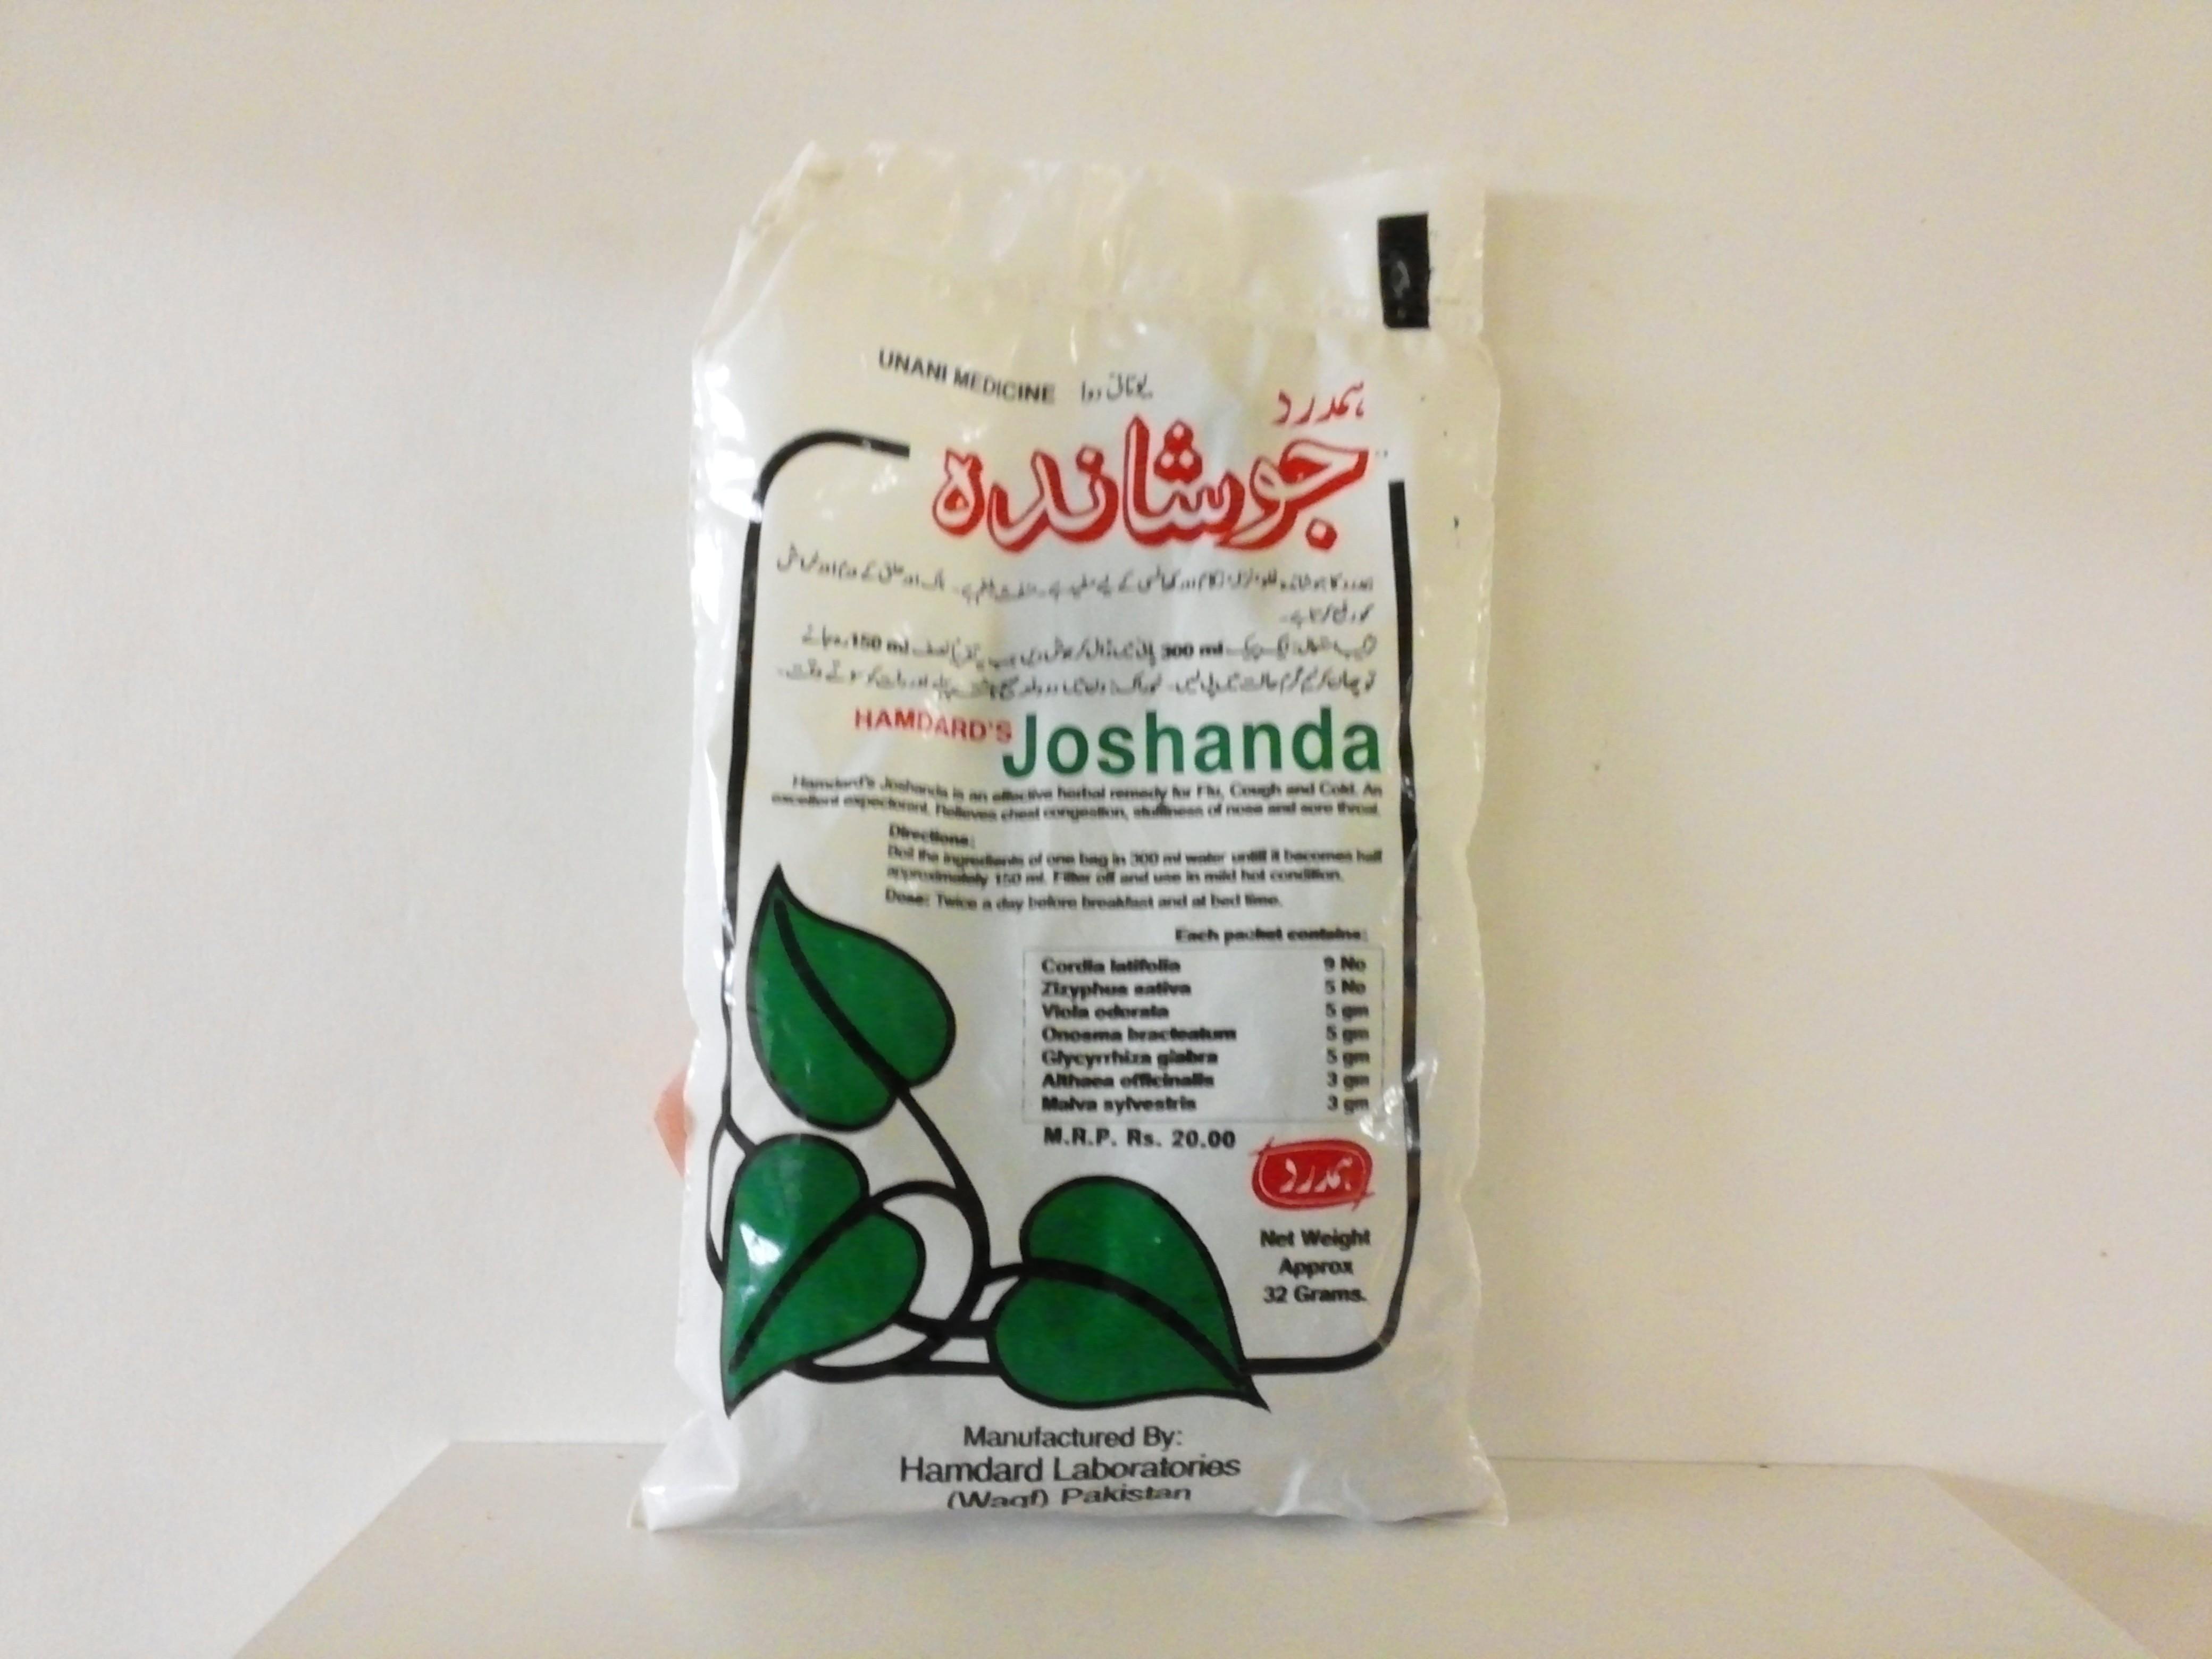 Hamdard's Joshanda 32 grm Pouch